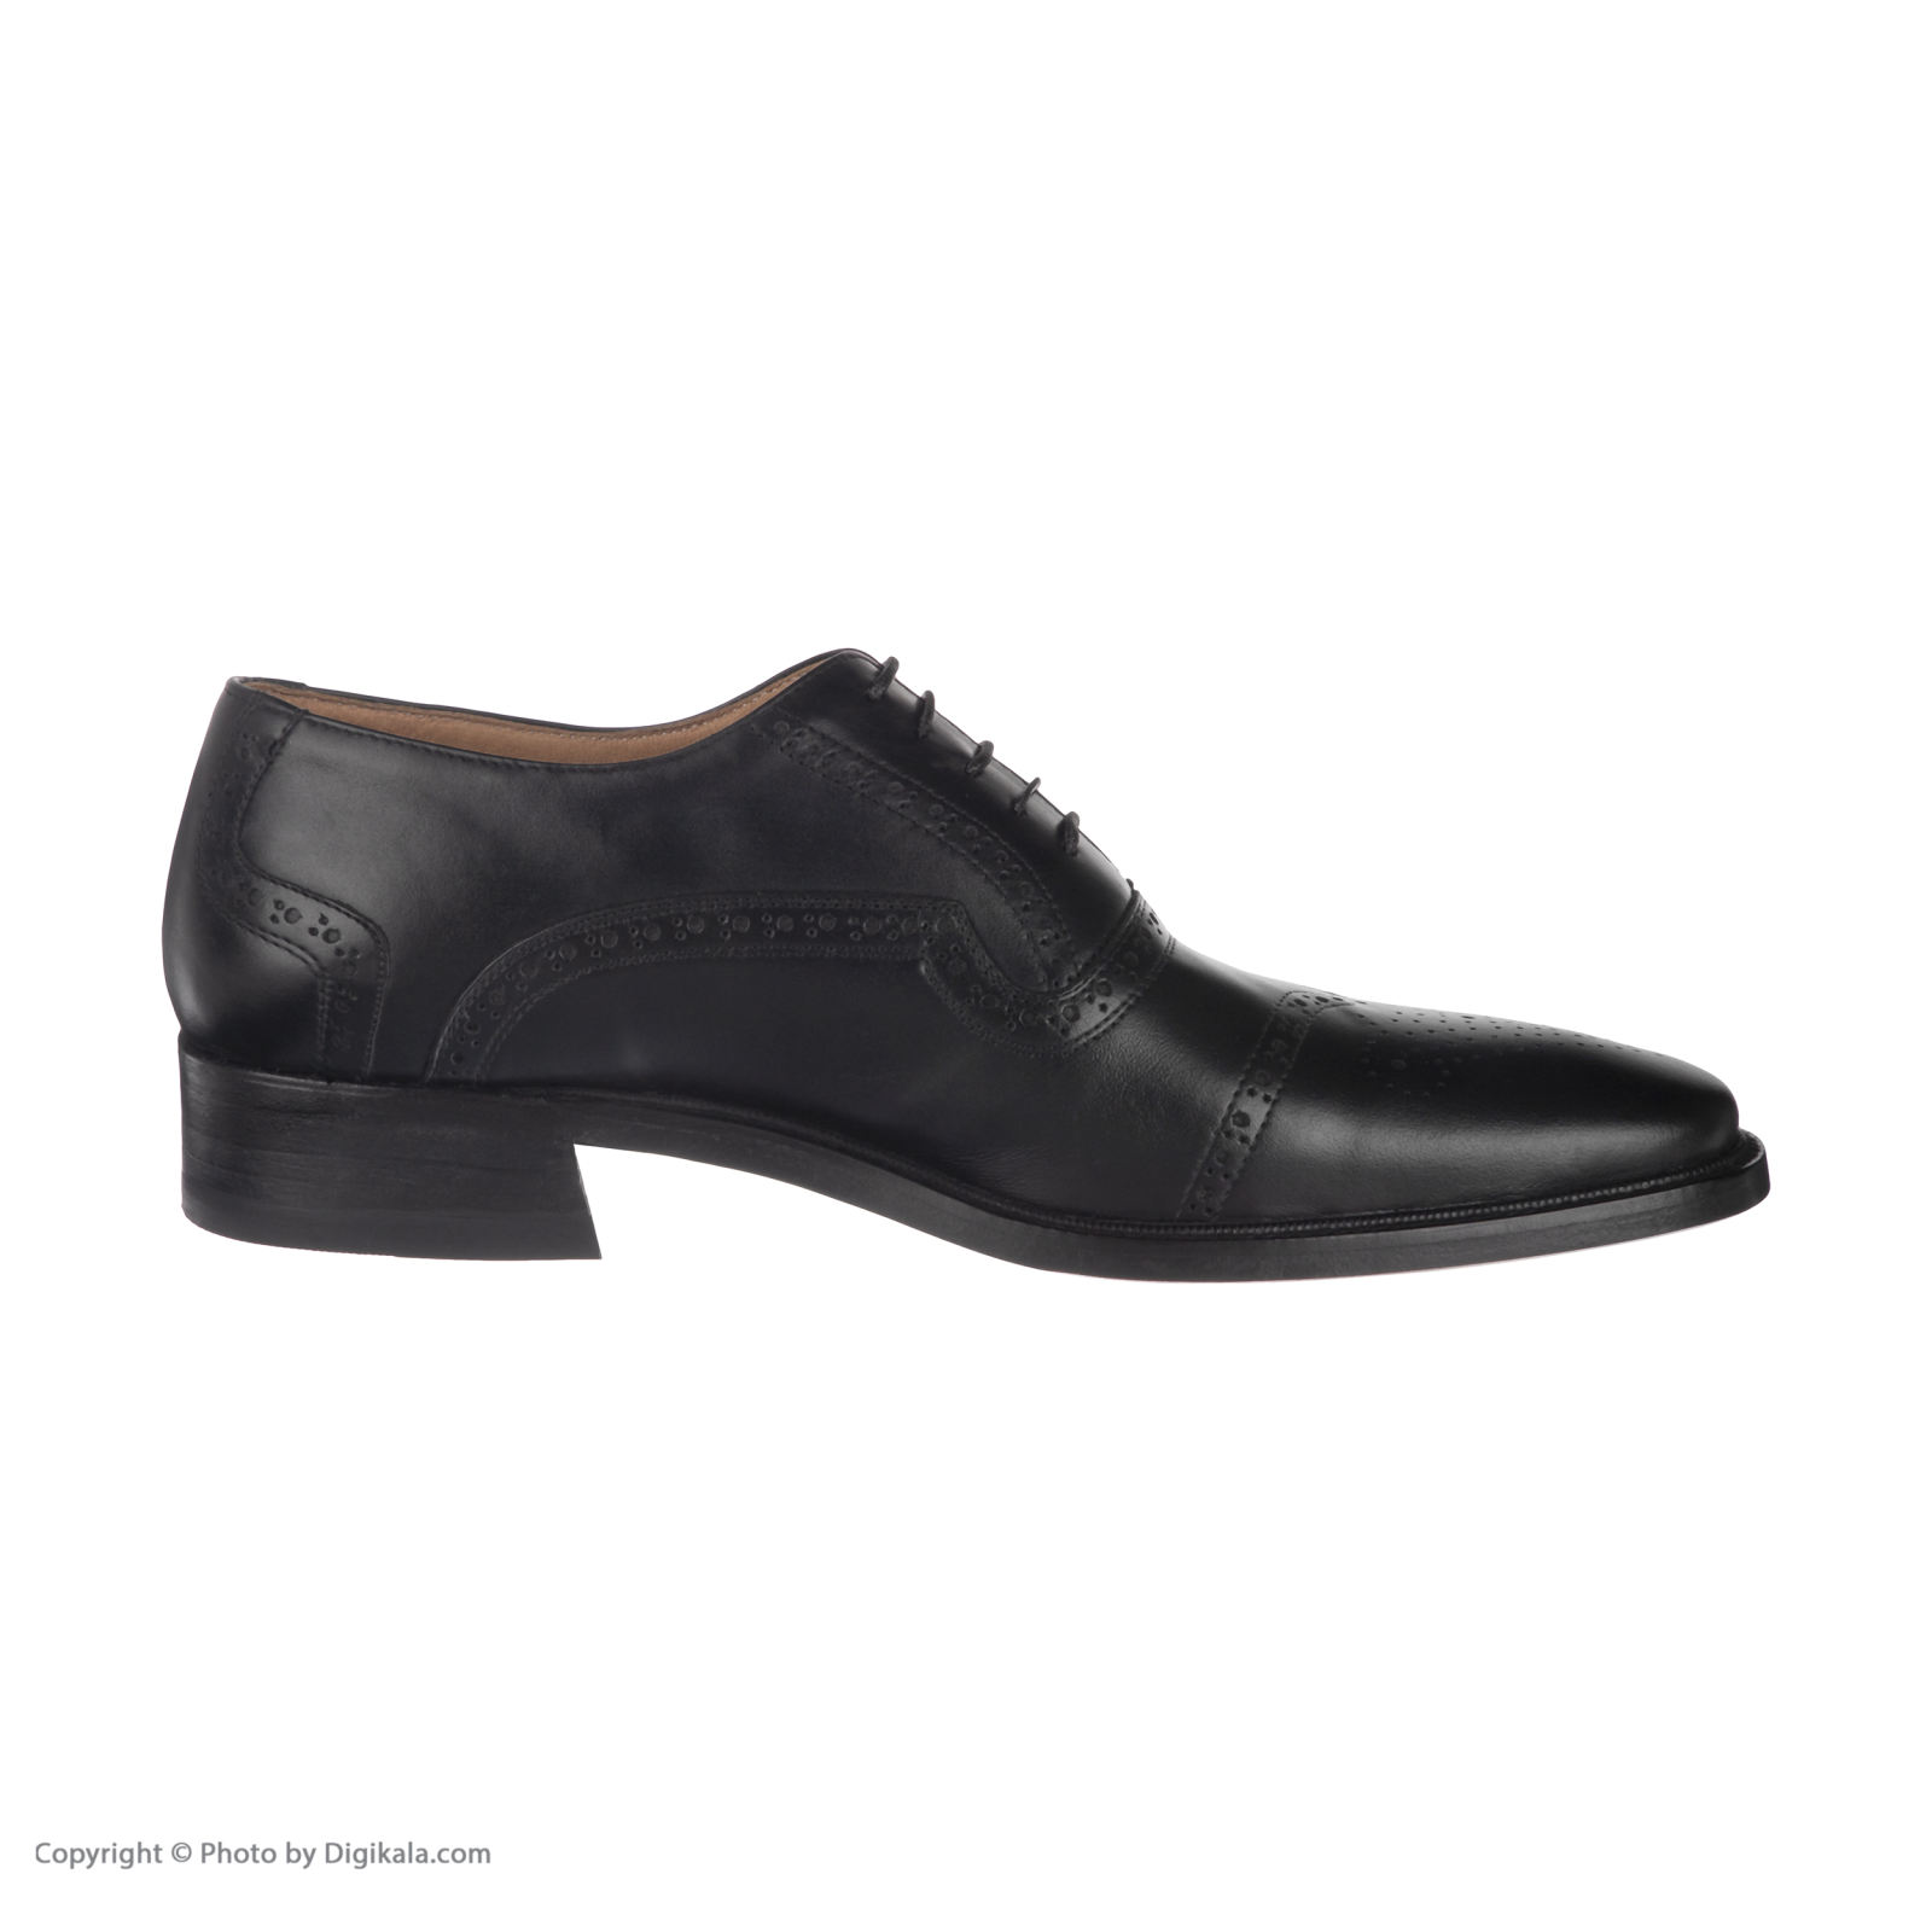 کفش مردانه نظری کد 433 -  - 5